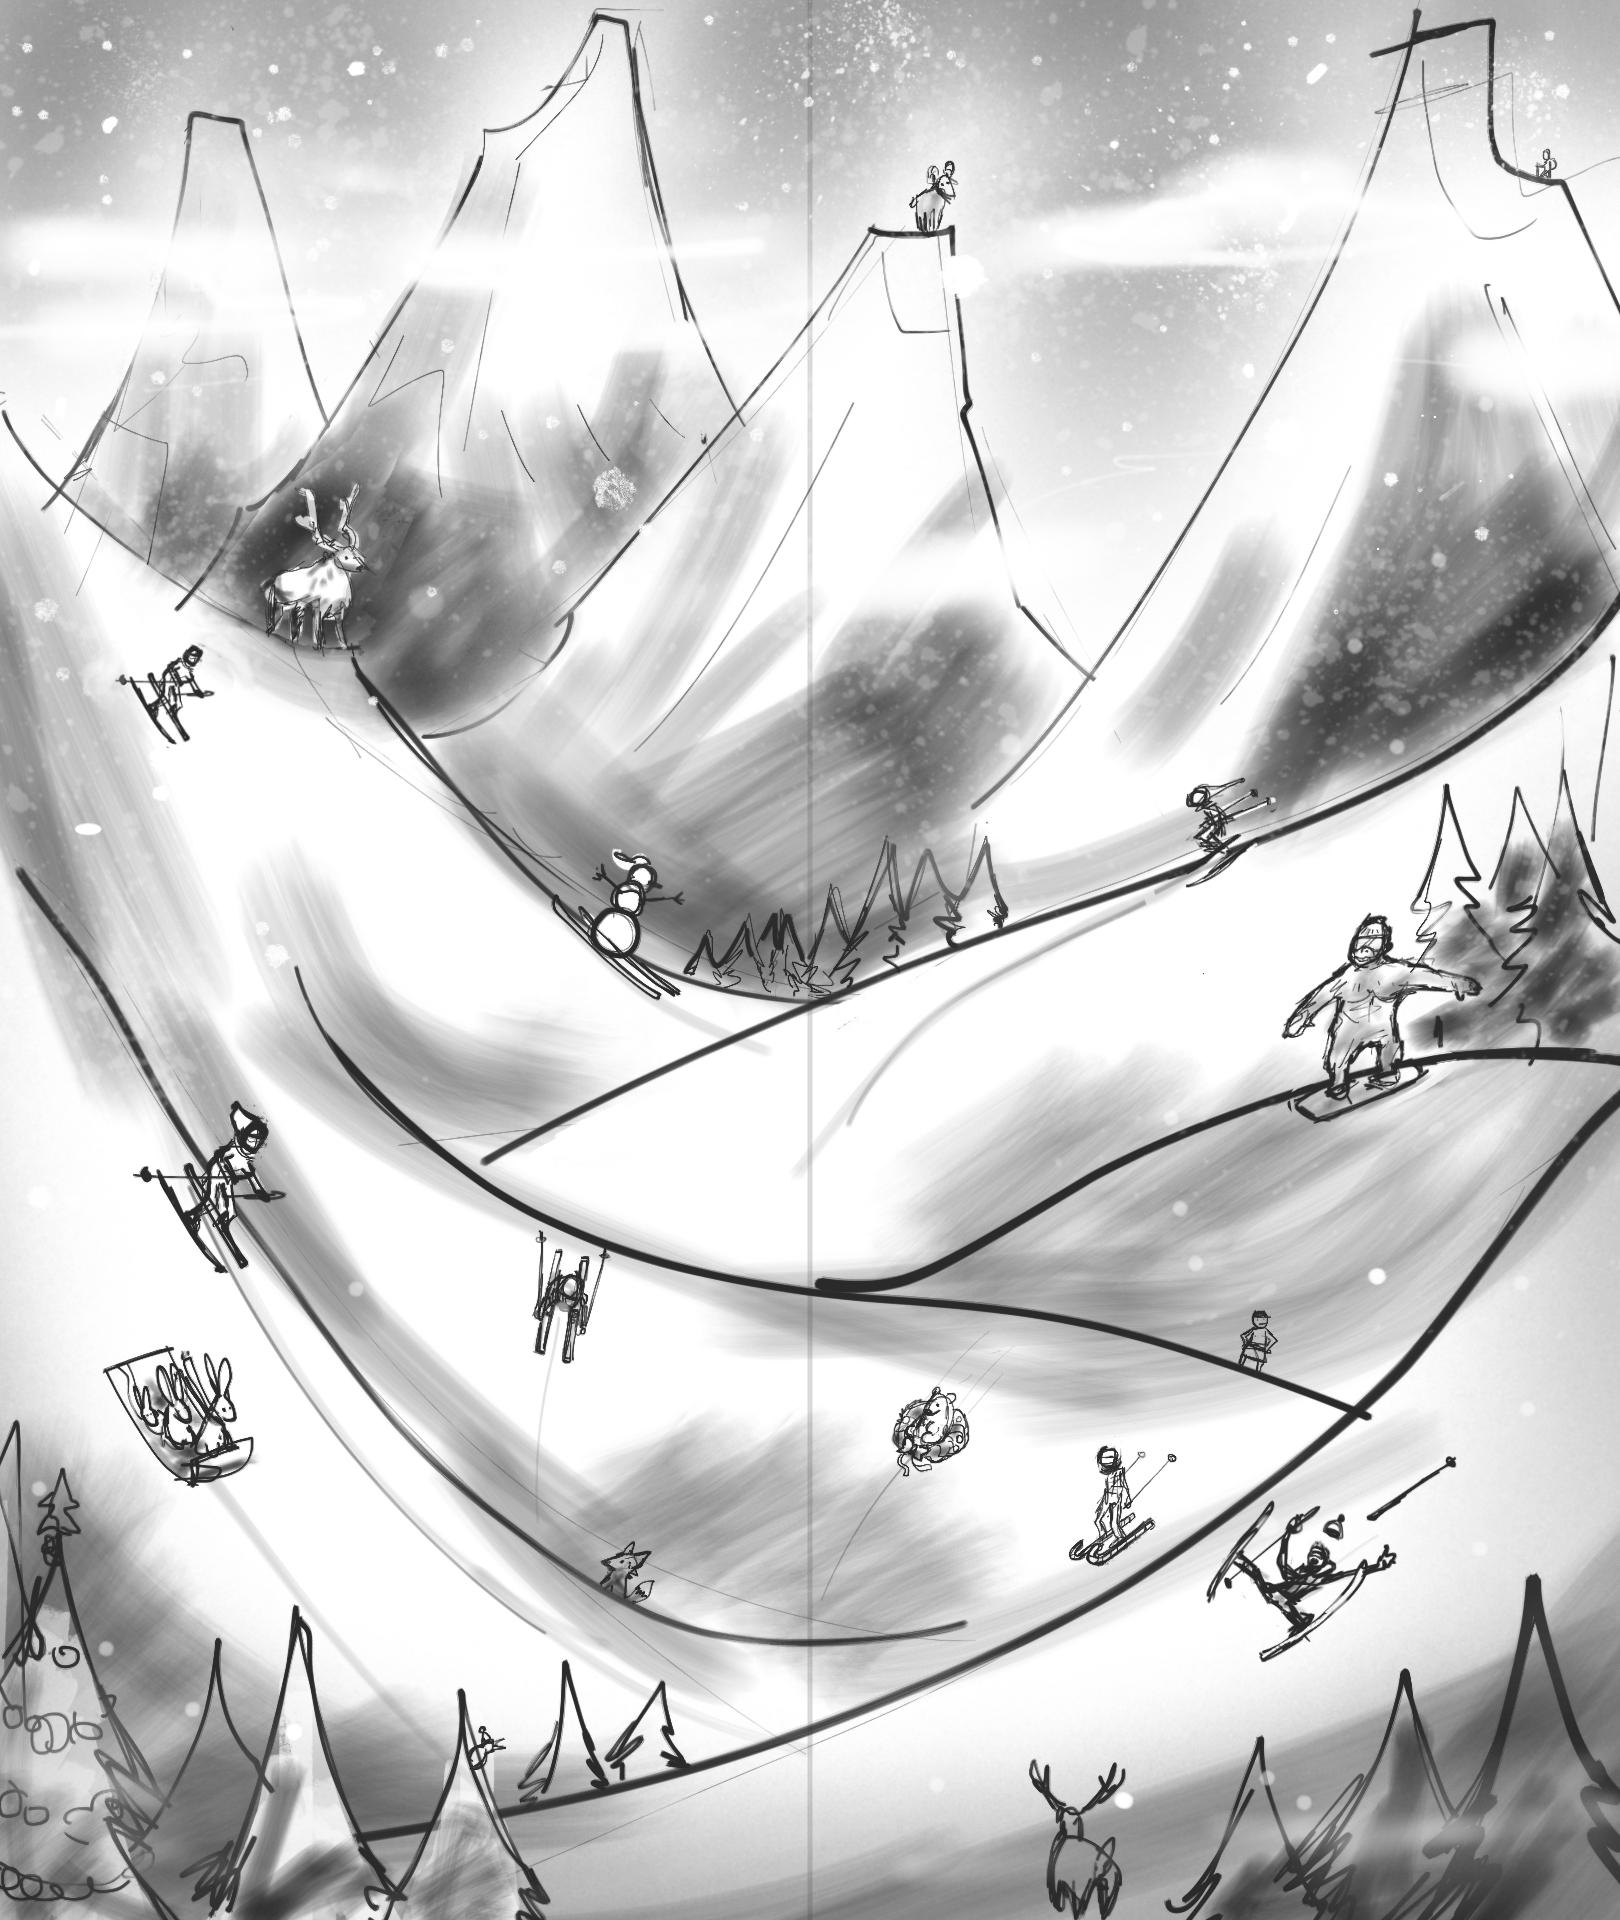 091415_WinterStories_02AlpineSkiing.jpg